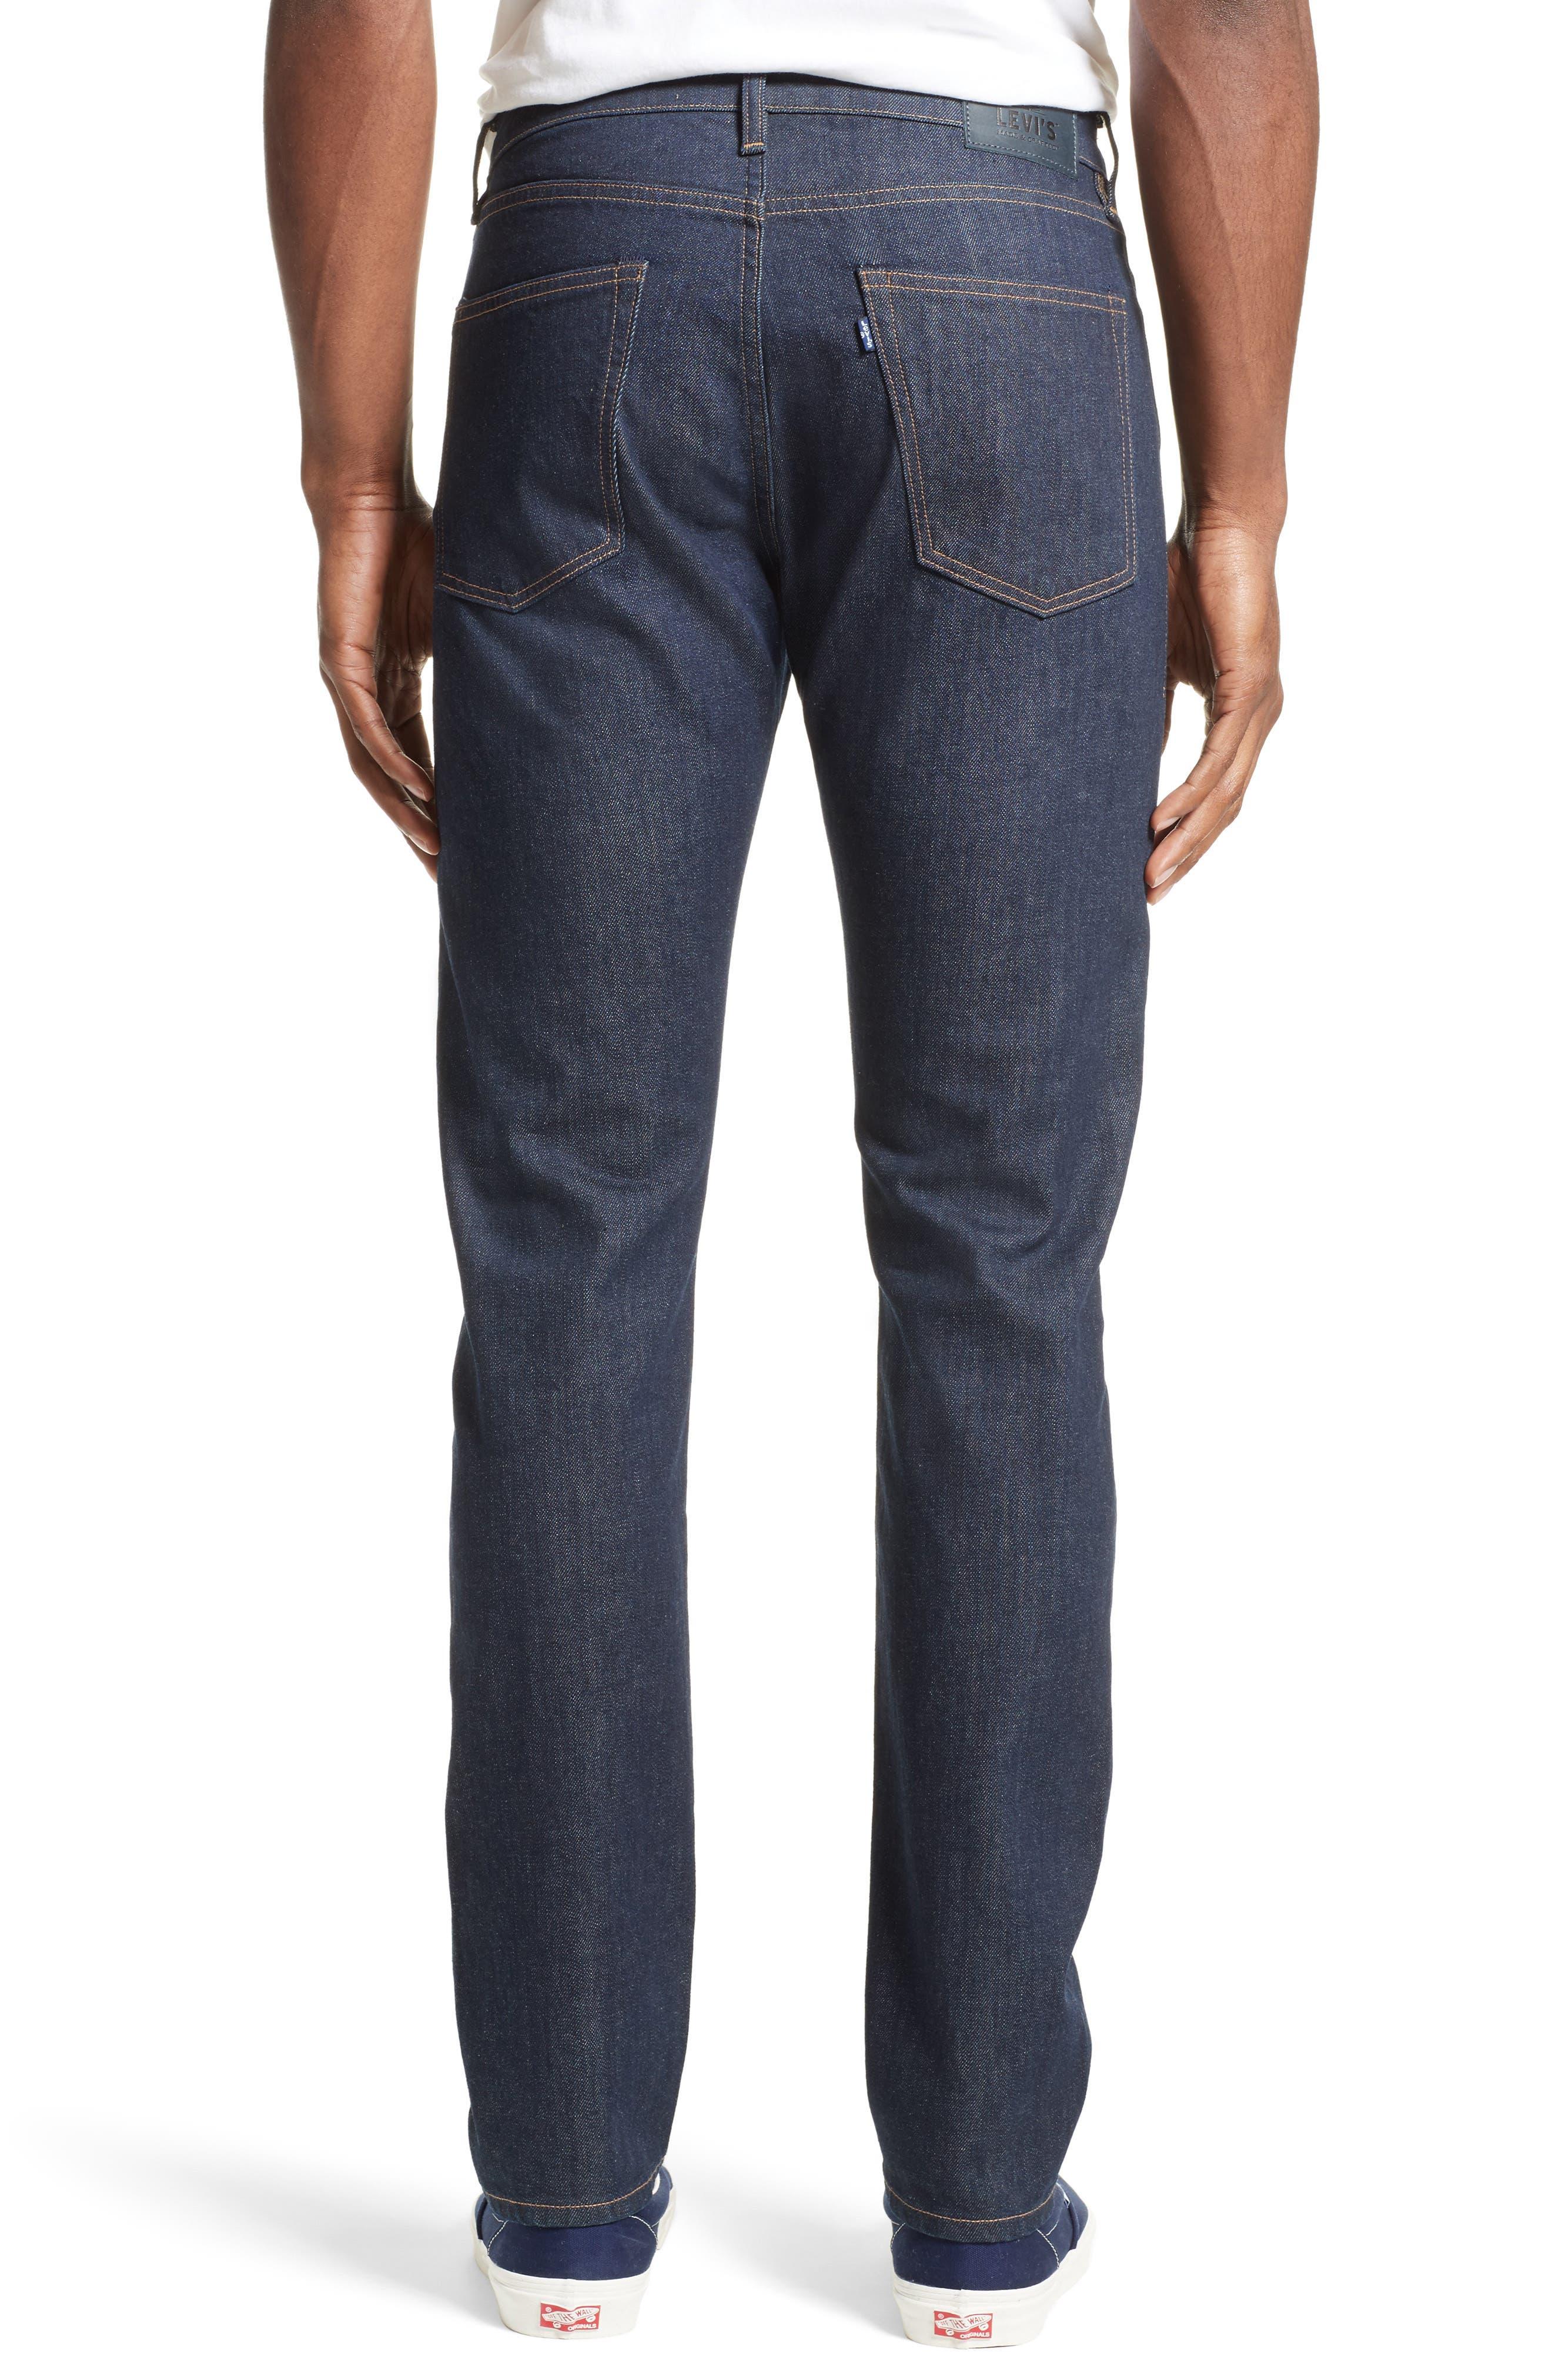 Tack Slim Fit Jeans,                             Alternate thumbnail 2, color,                             Dark Blue